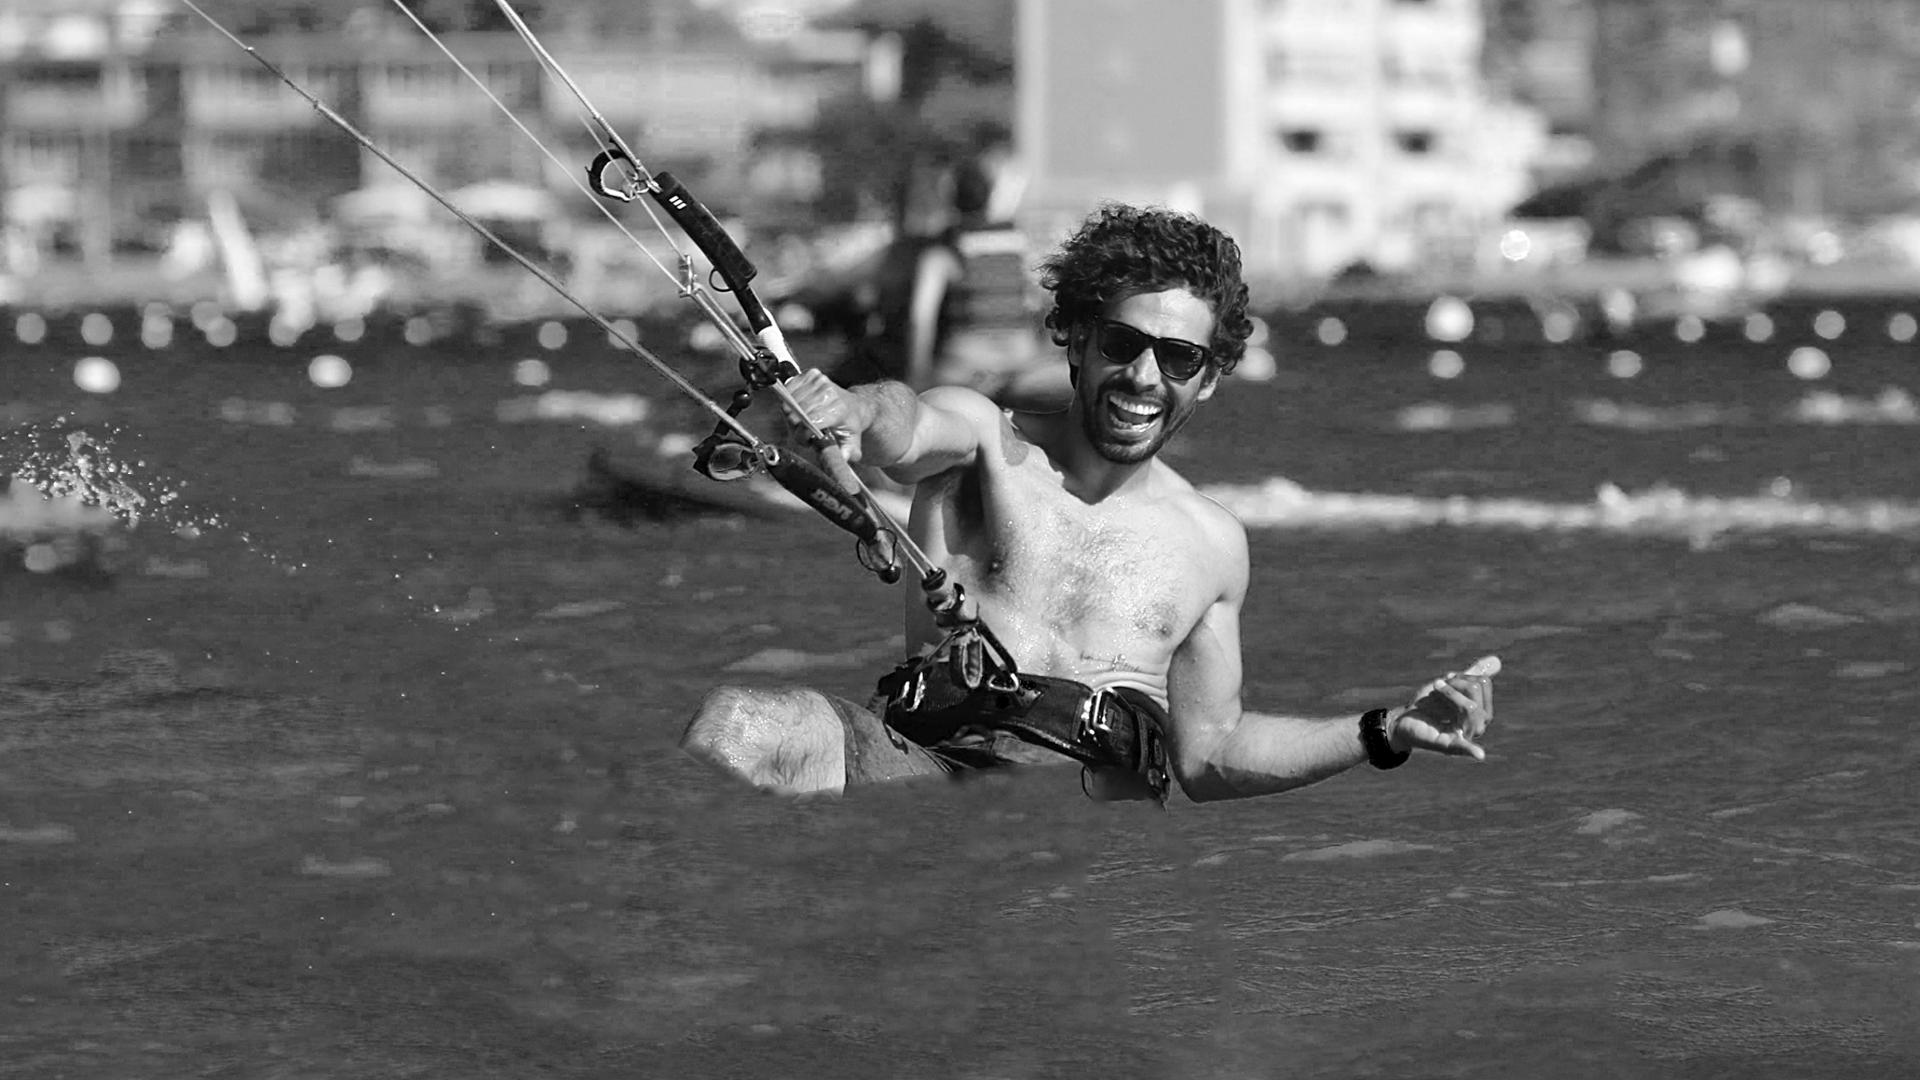 germananavarro miguelo kitesurf intrusctor IKO Featured Agua BG